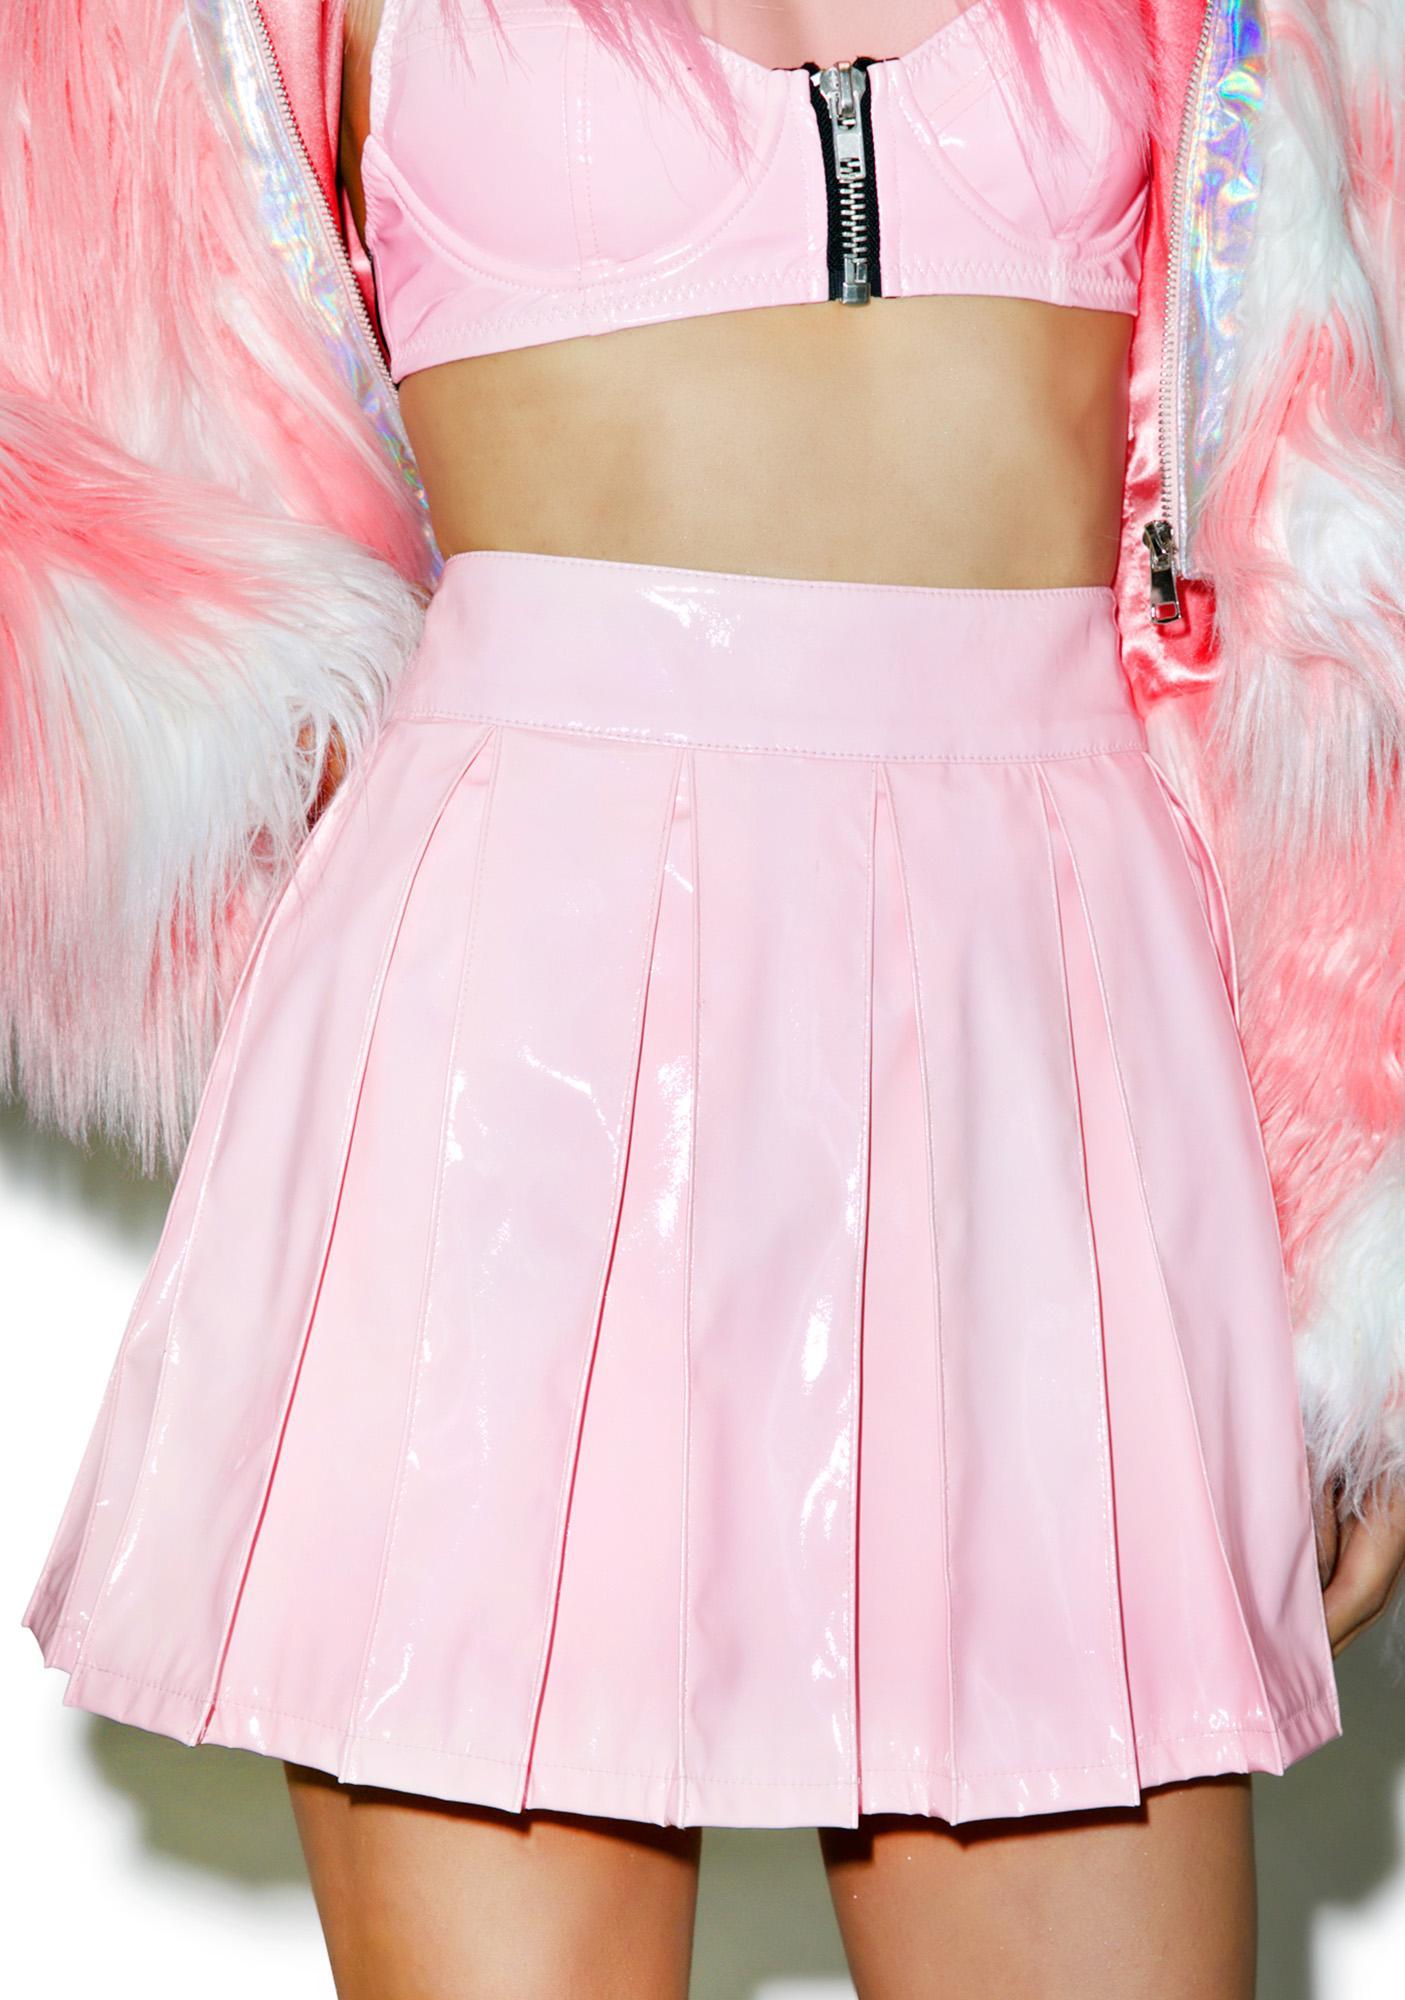 24HRS Princess Pastel Vinyl Skirt